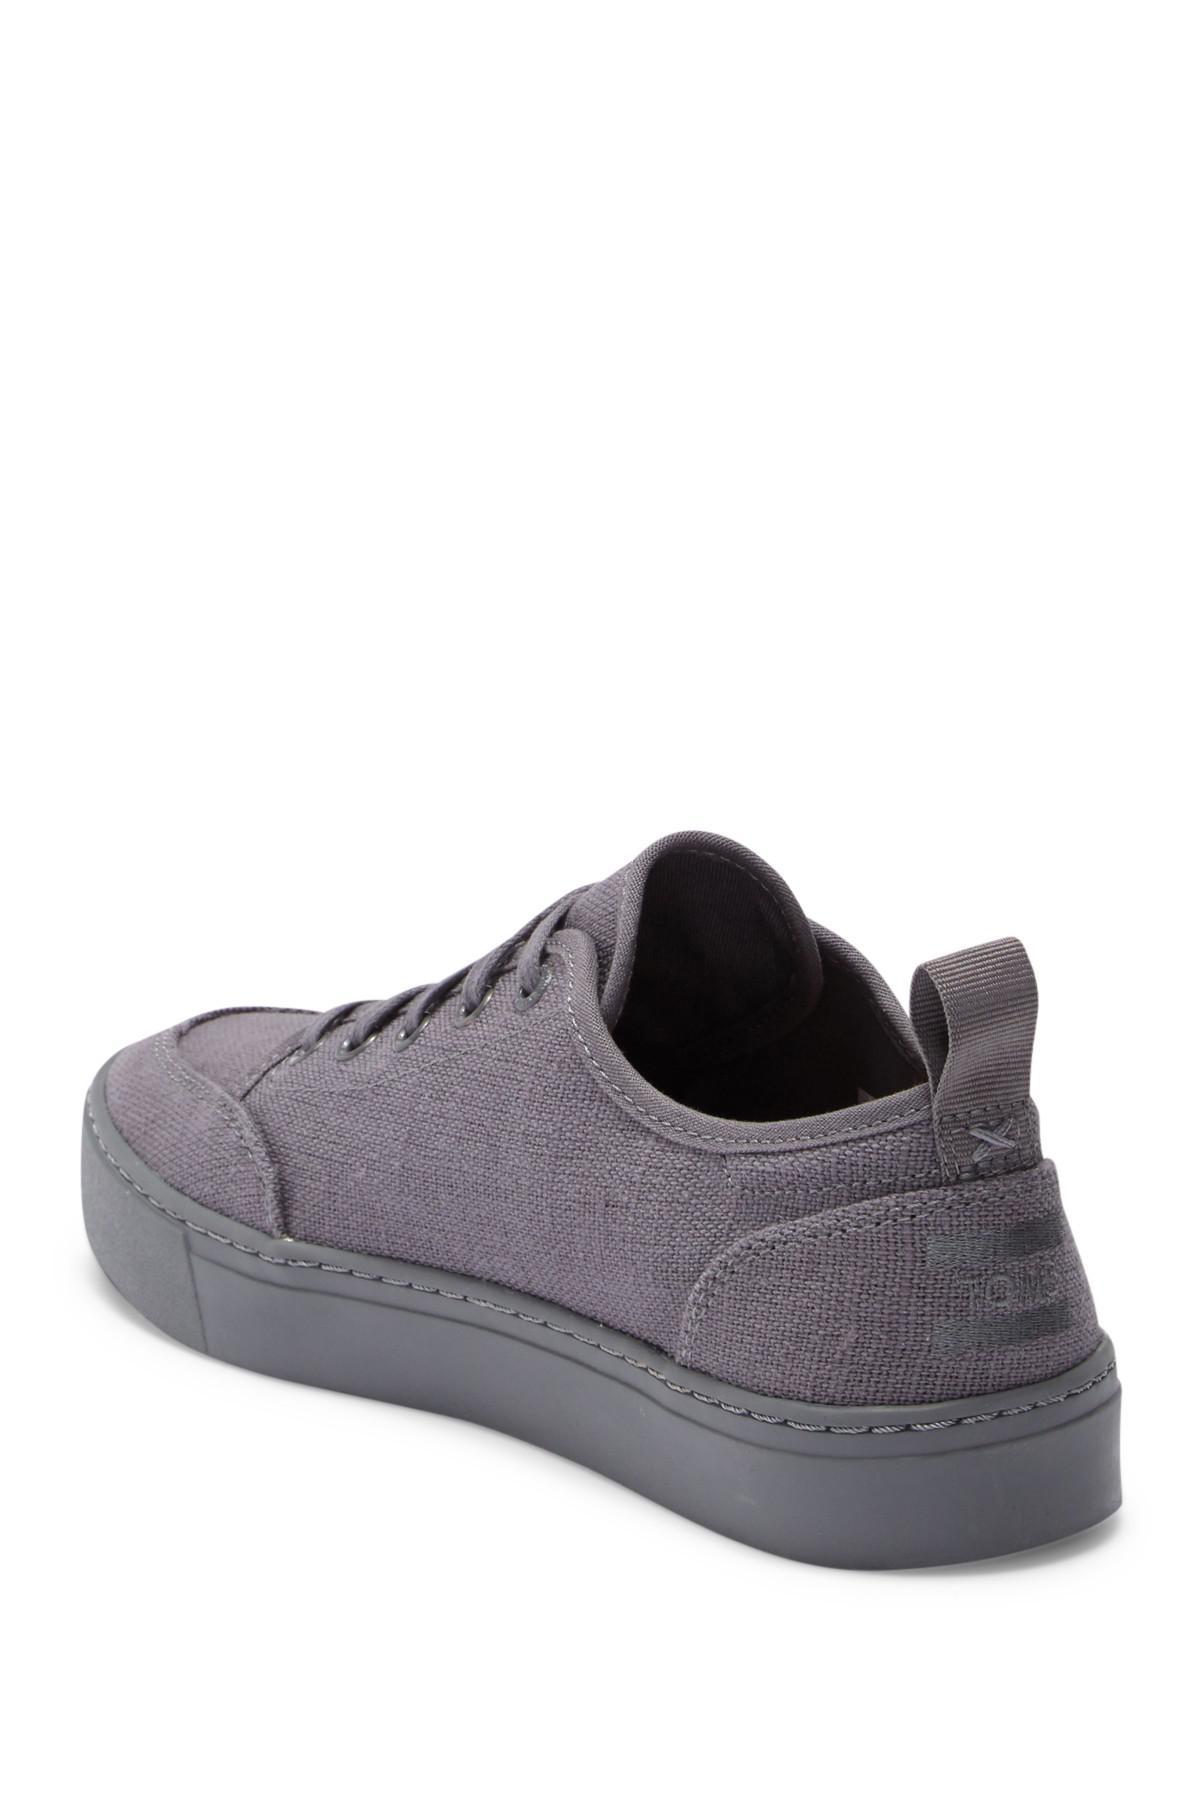 TOMS Landen Canvas Sneaker in Grey